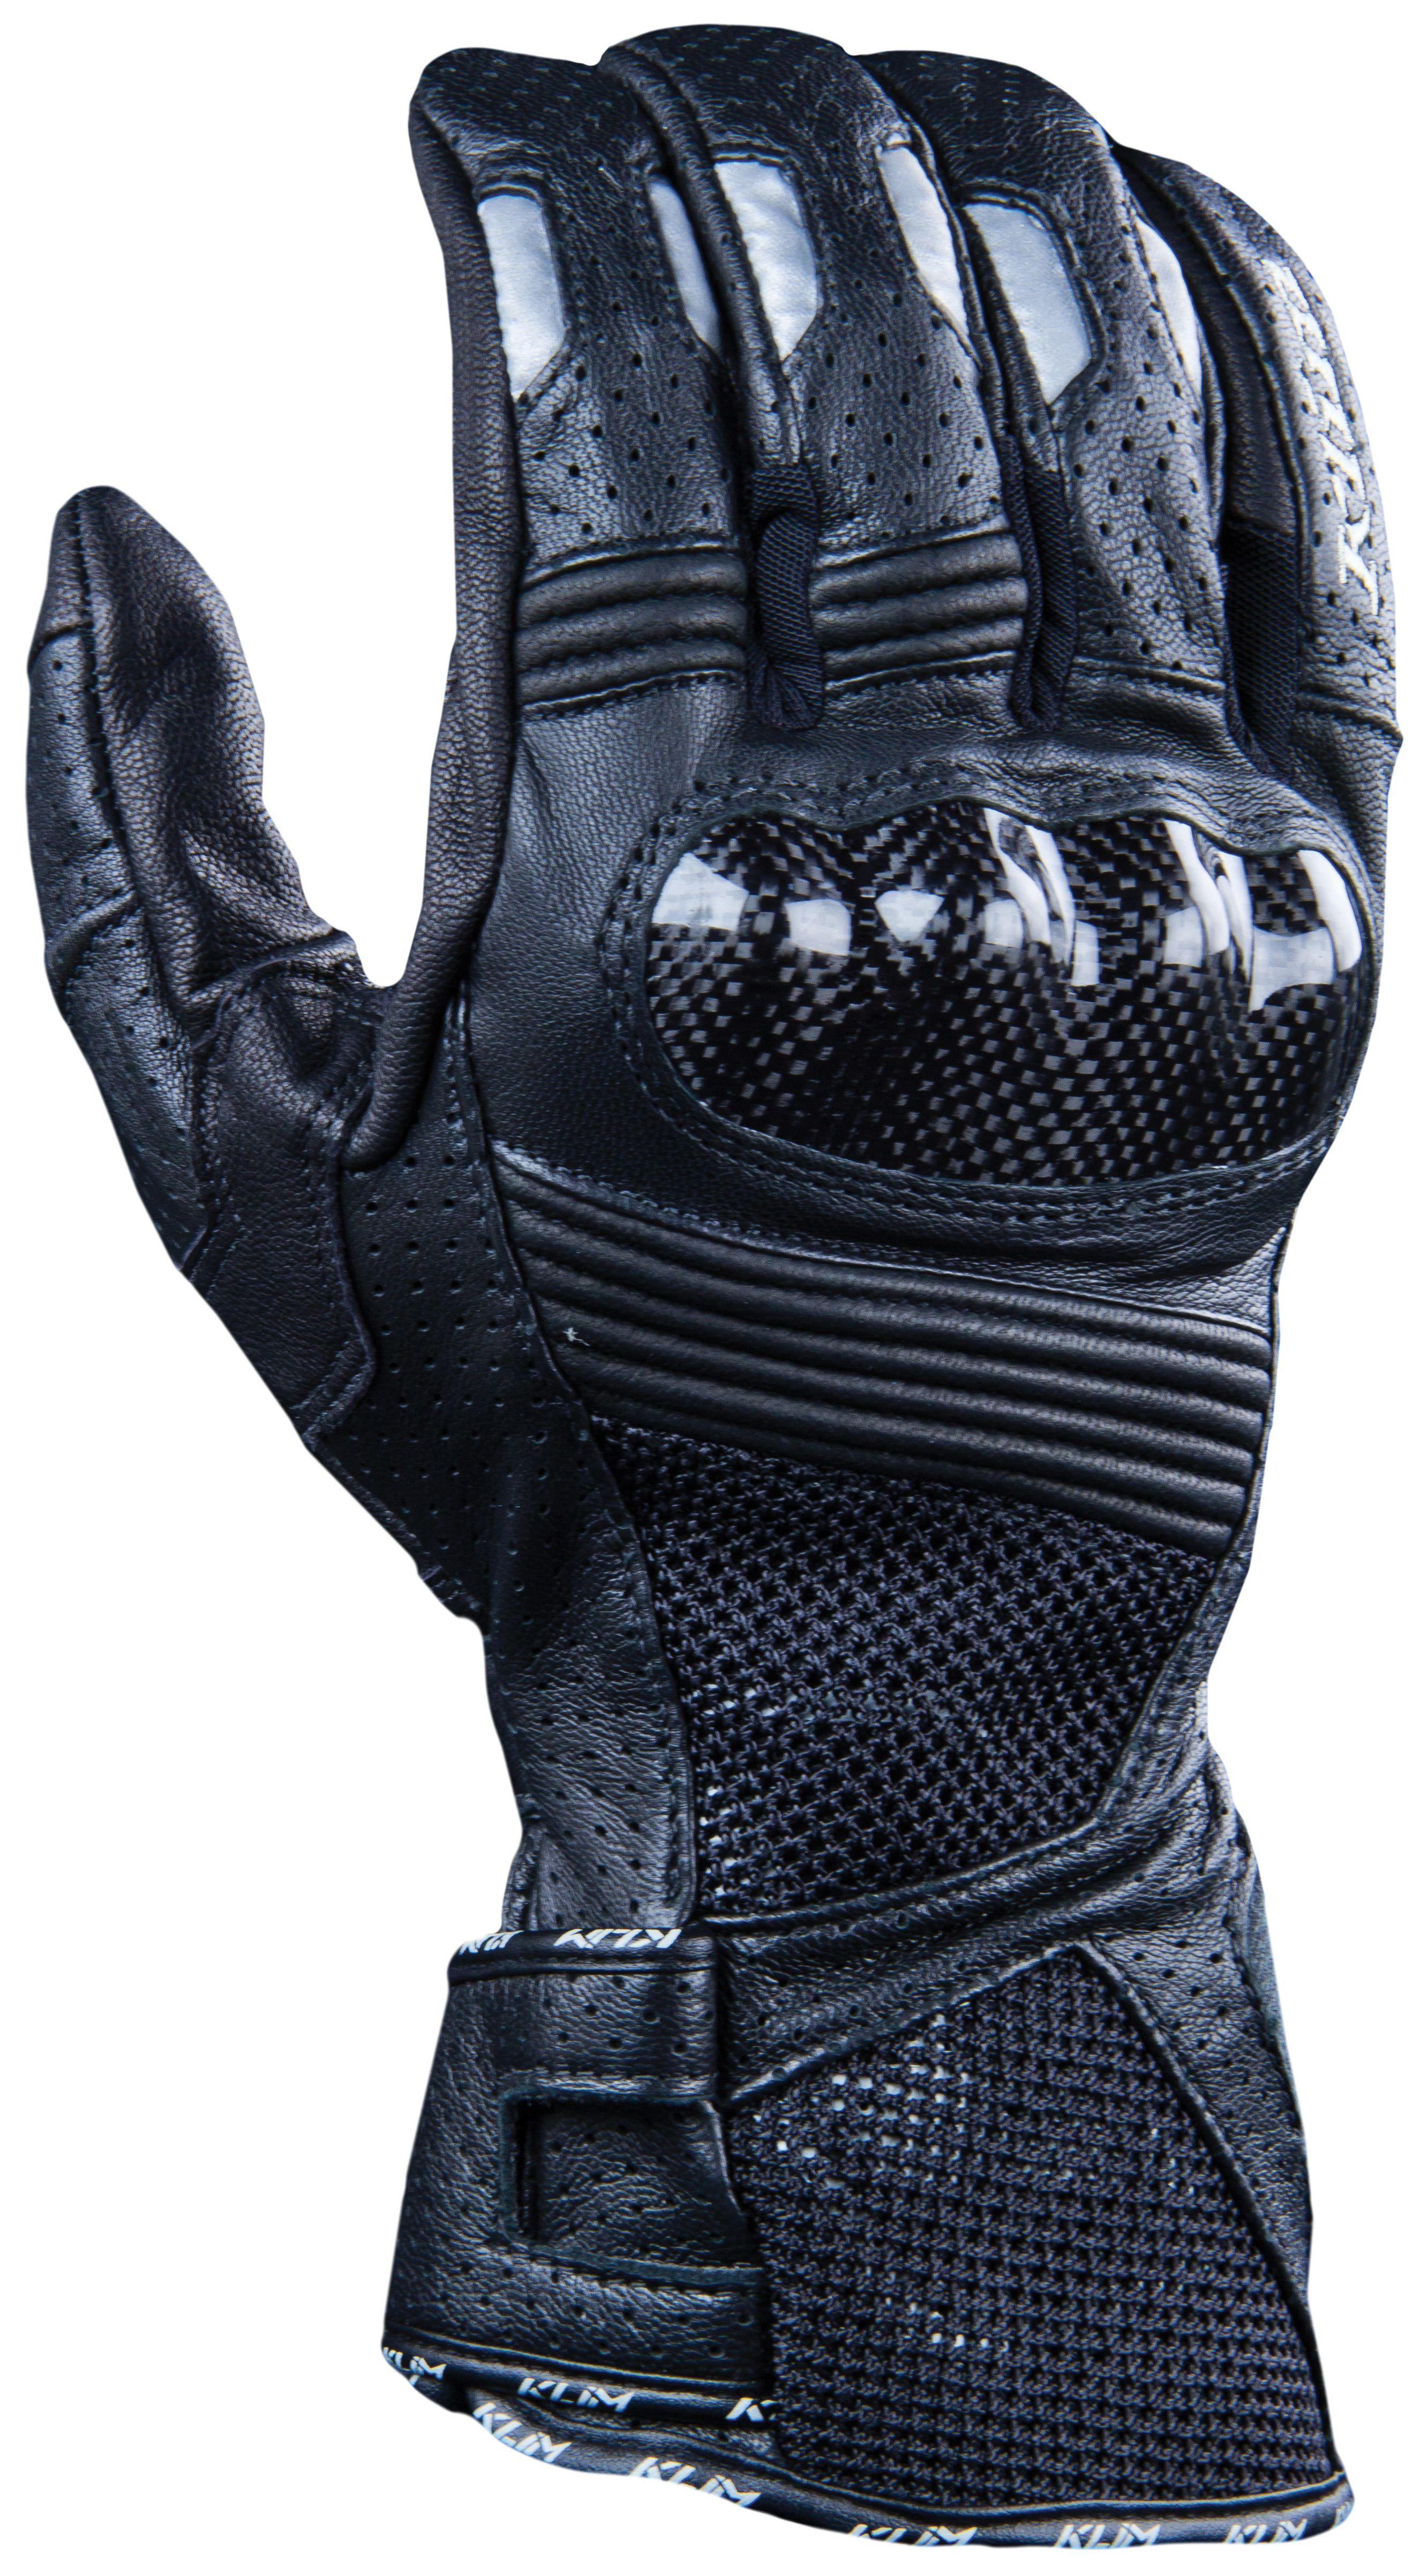 Motorcycle gloves external seams - Motorcycle Gloves External Seams 26